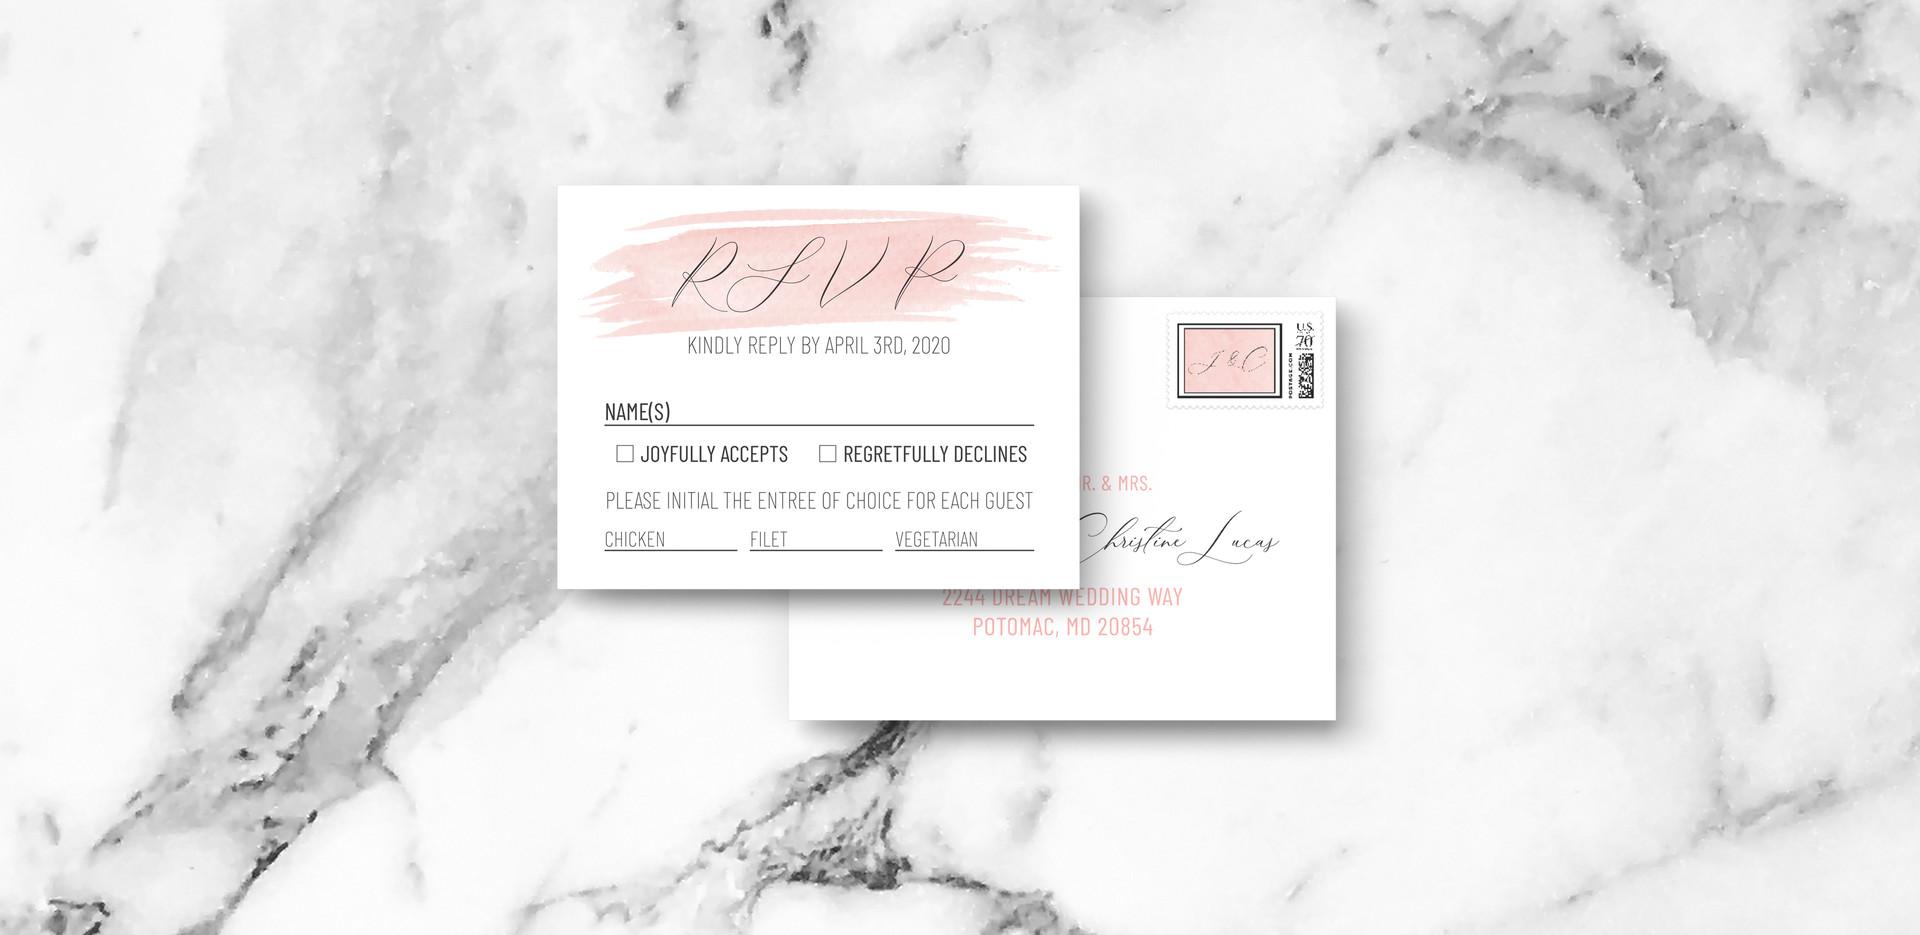 RSVP + Envelope 2